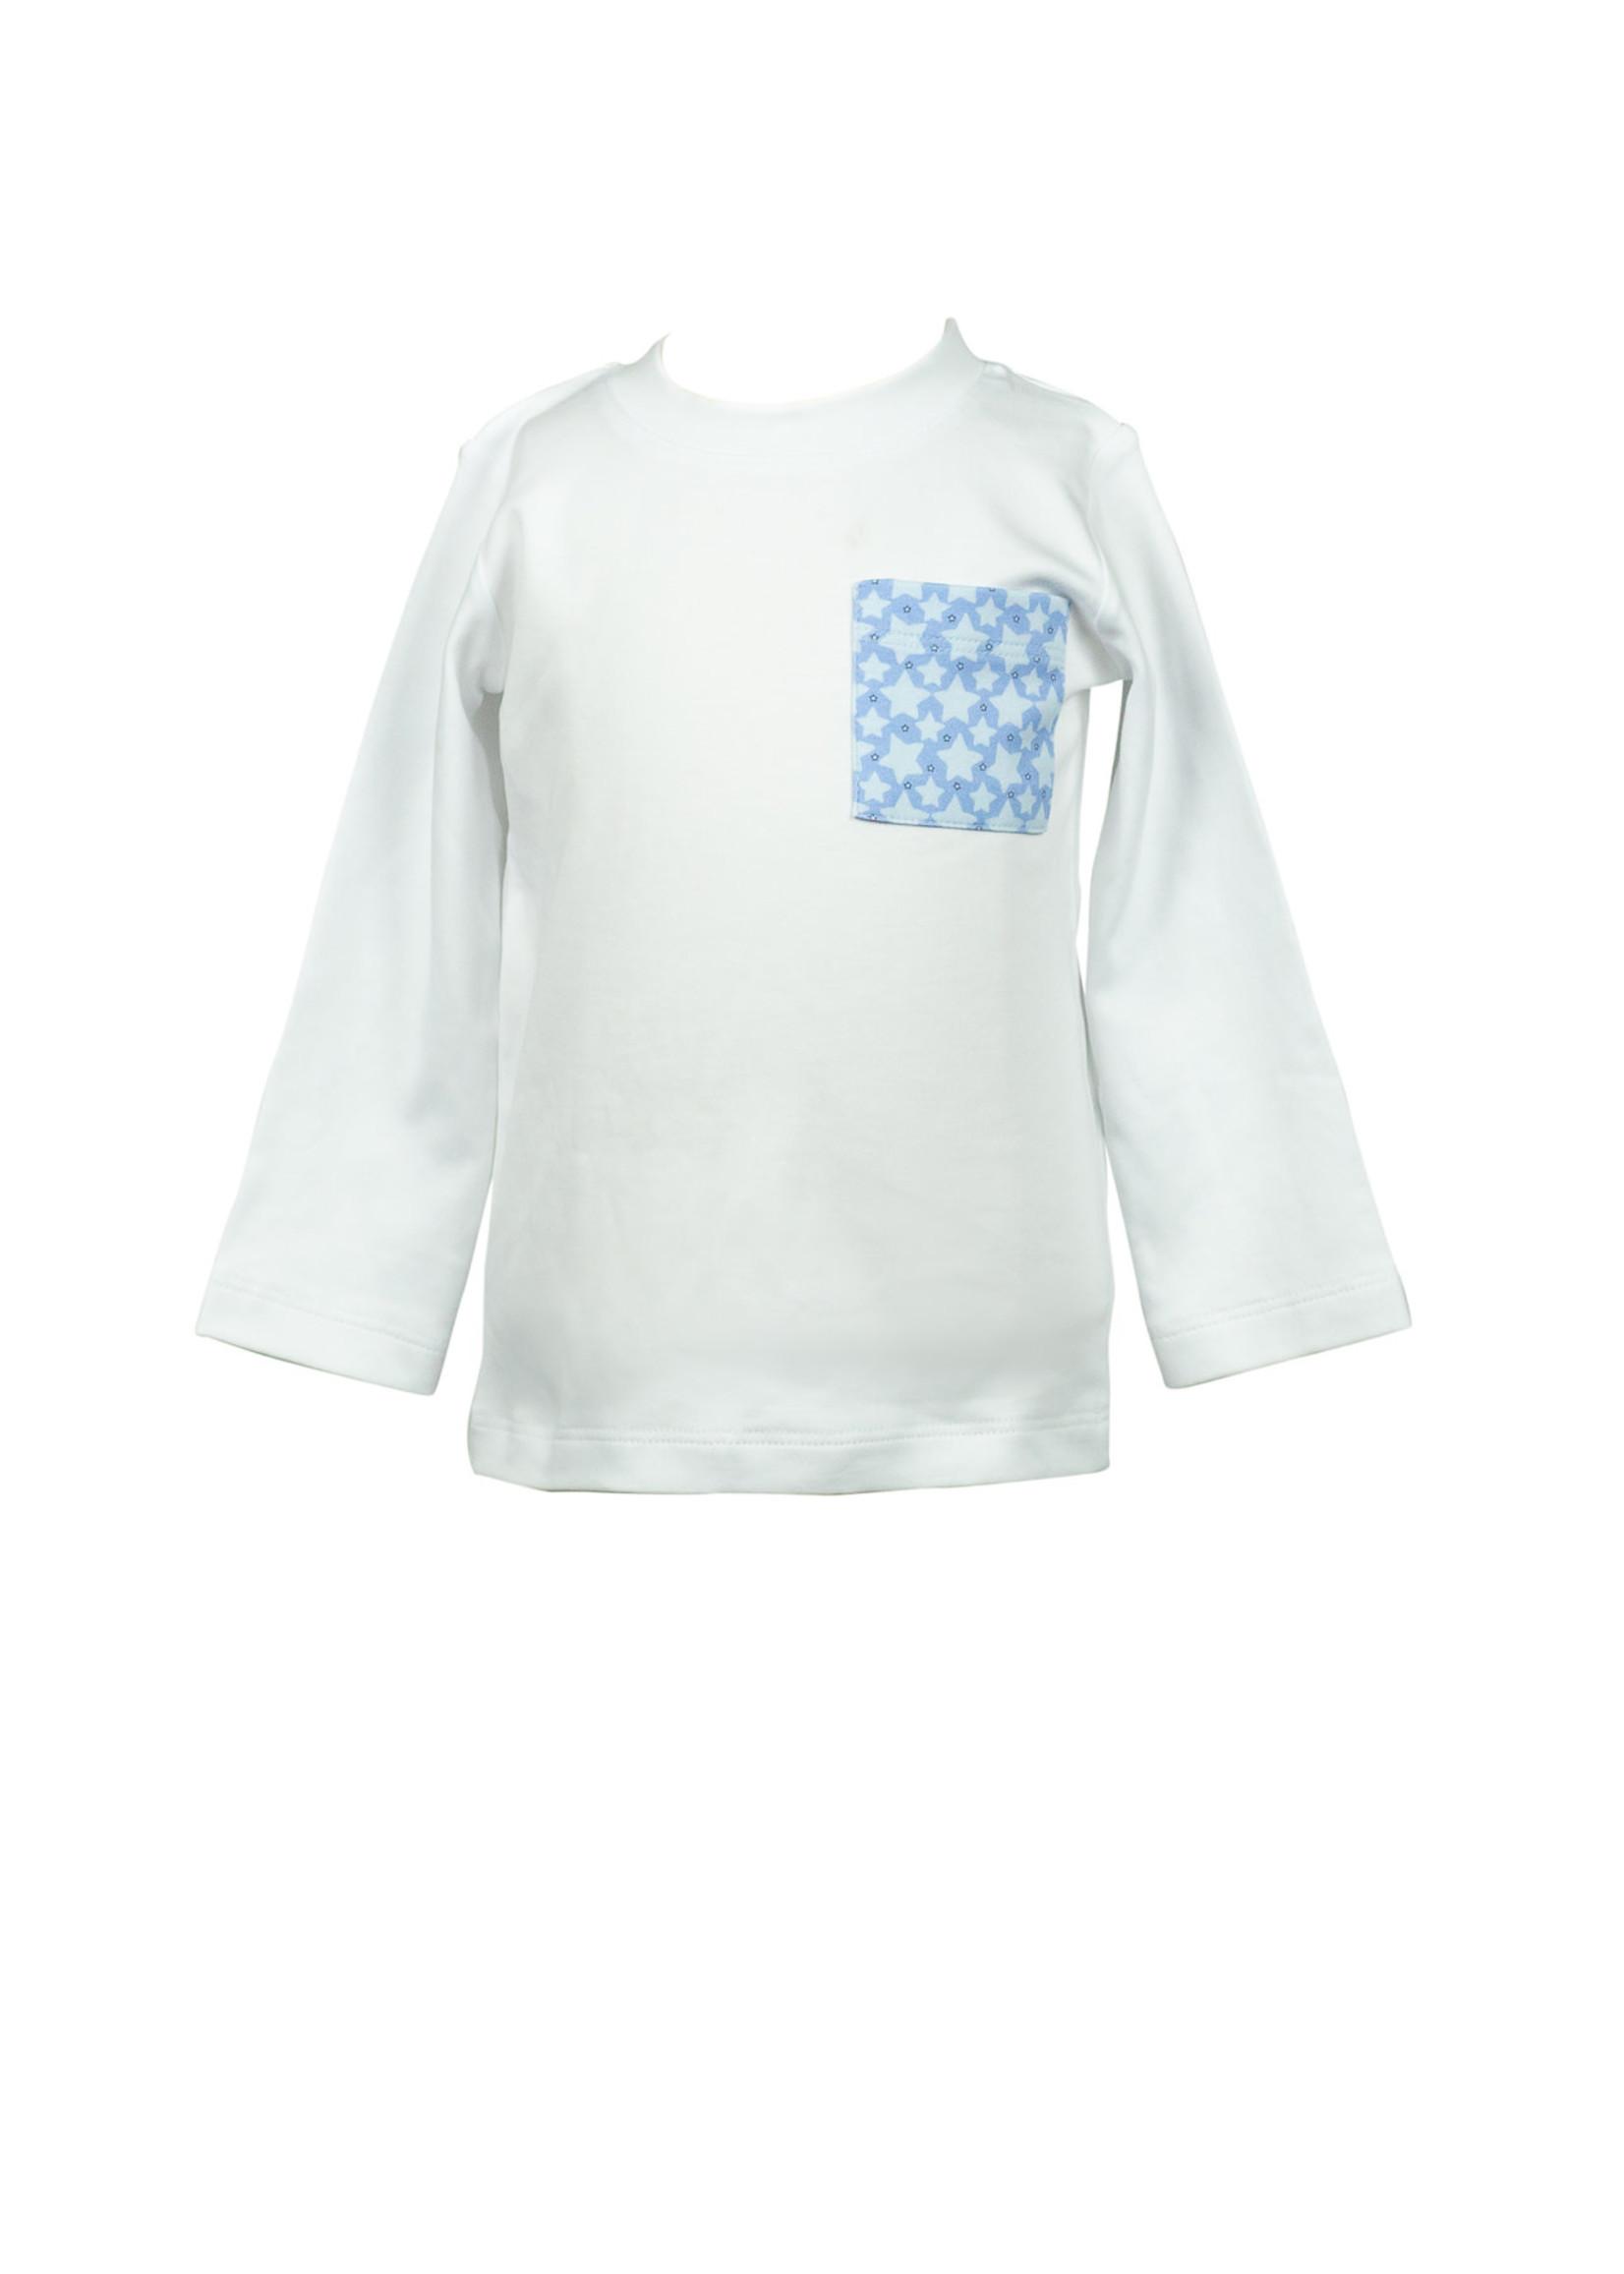 Proper Peony Stars Boy Pocket Tshirt